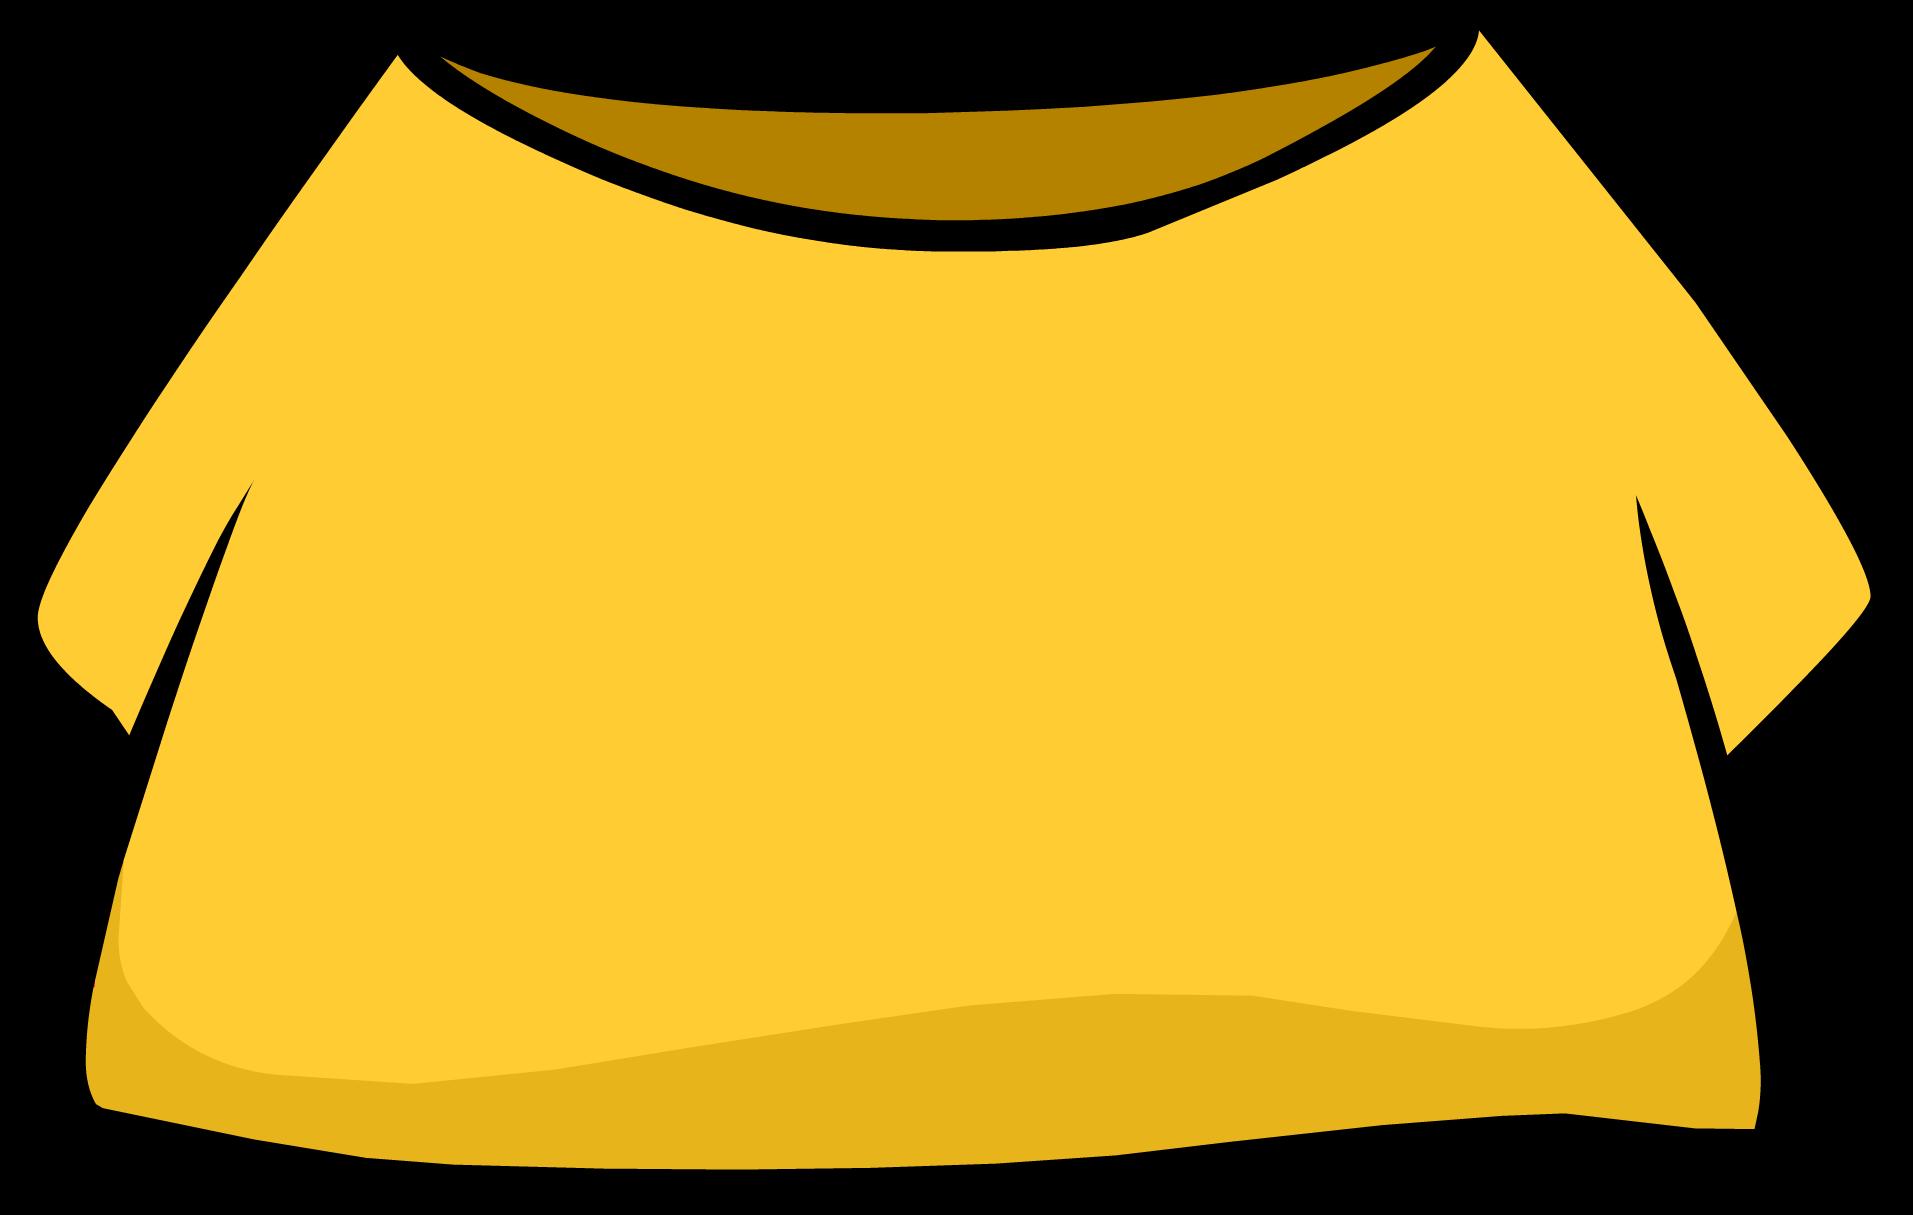 Club penguin wiki fandom. Clipart shirt yellow shirt